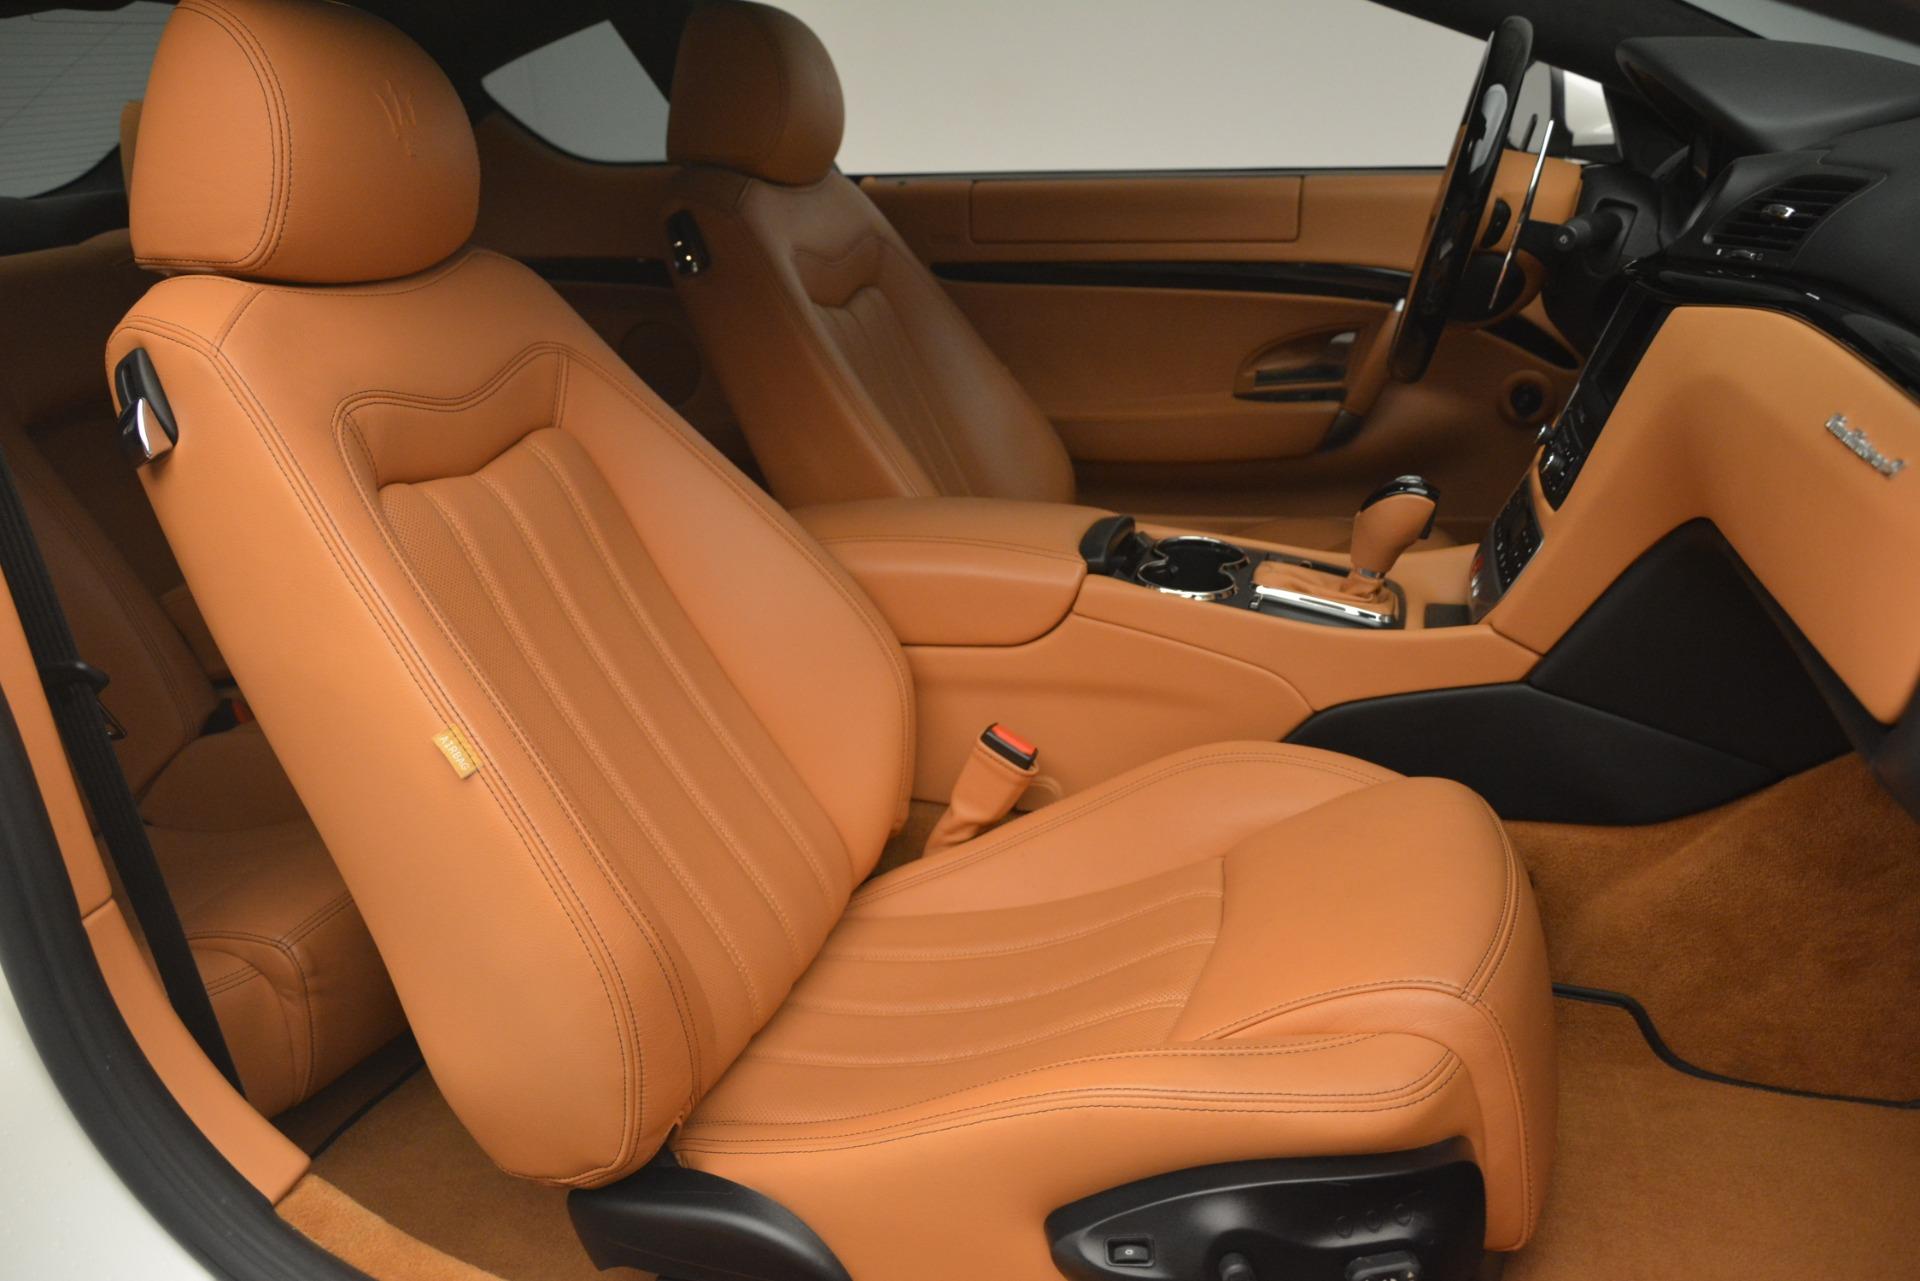 Used 2011 Maserati GranTurismo S Automatic For Sale In Westport, CT 3061_p18